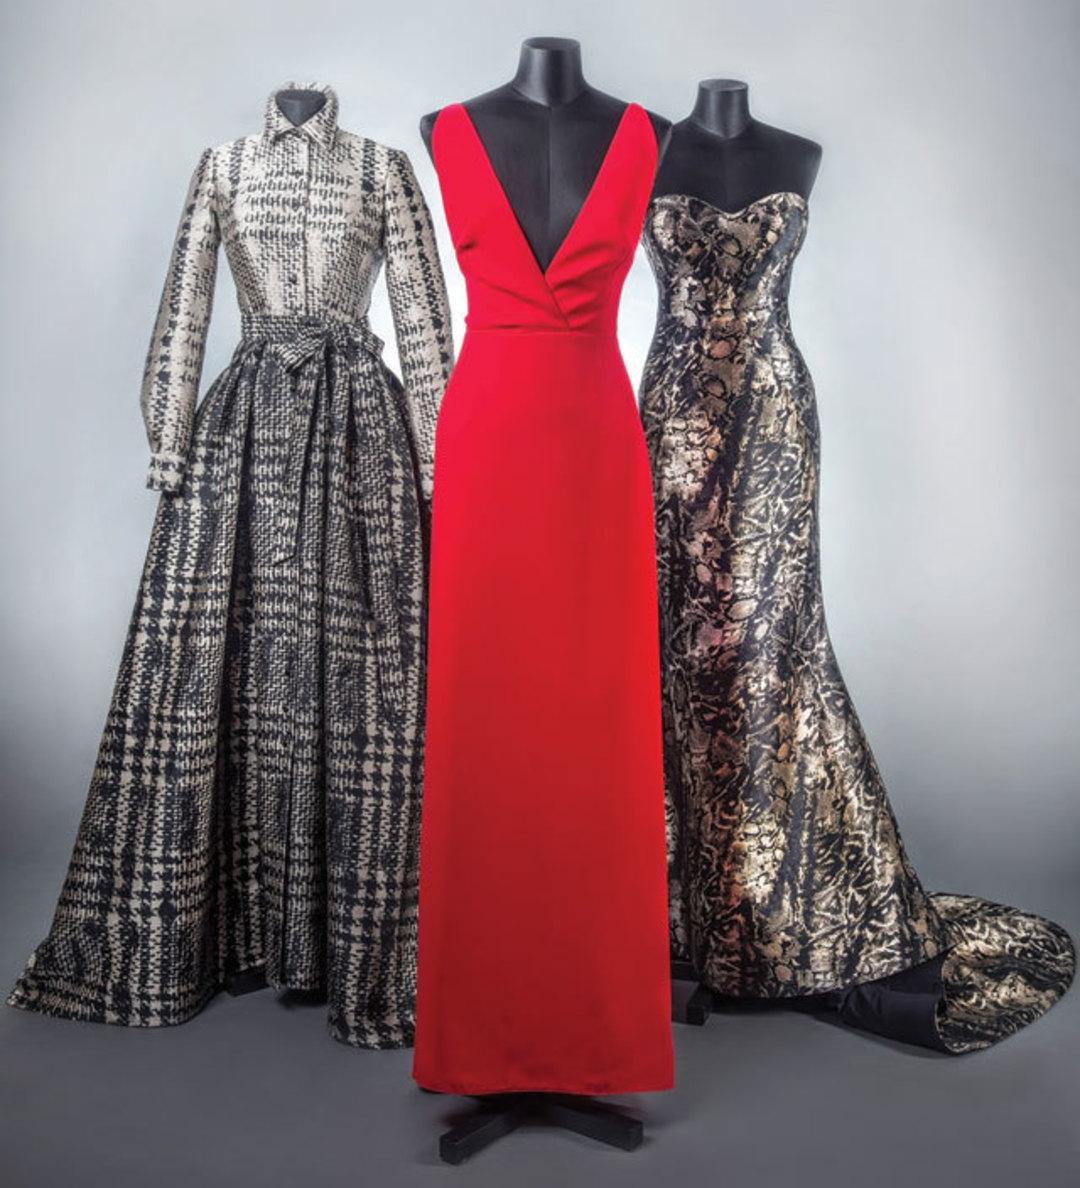 Three Gowns for Gala Season | Houstonia